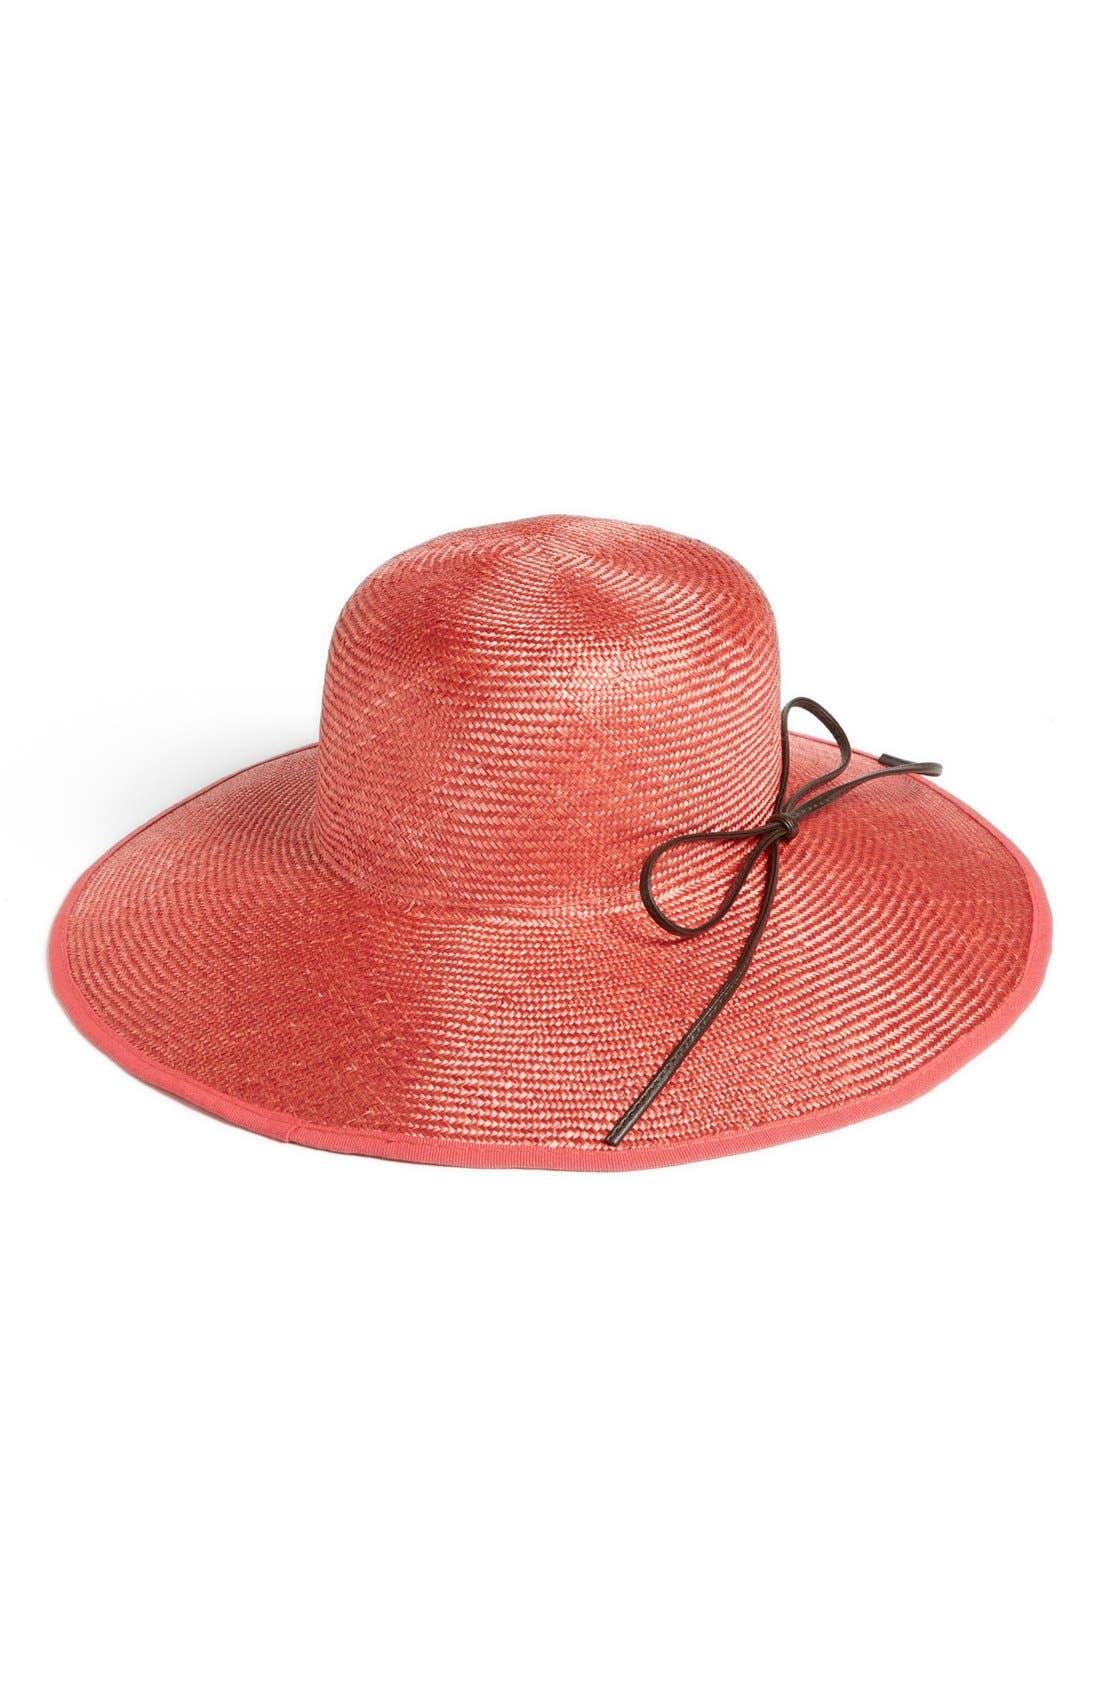 Alternate Image 1 Selected - Nordstrom Packable Straw Hat